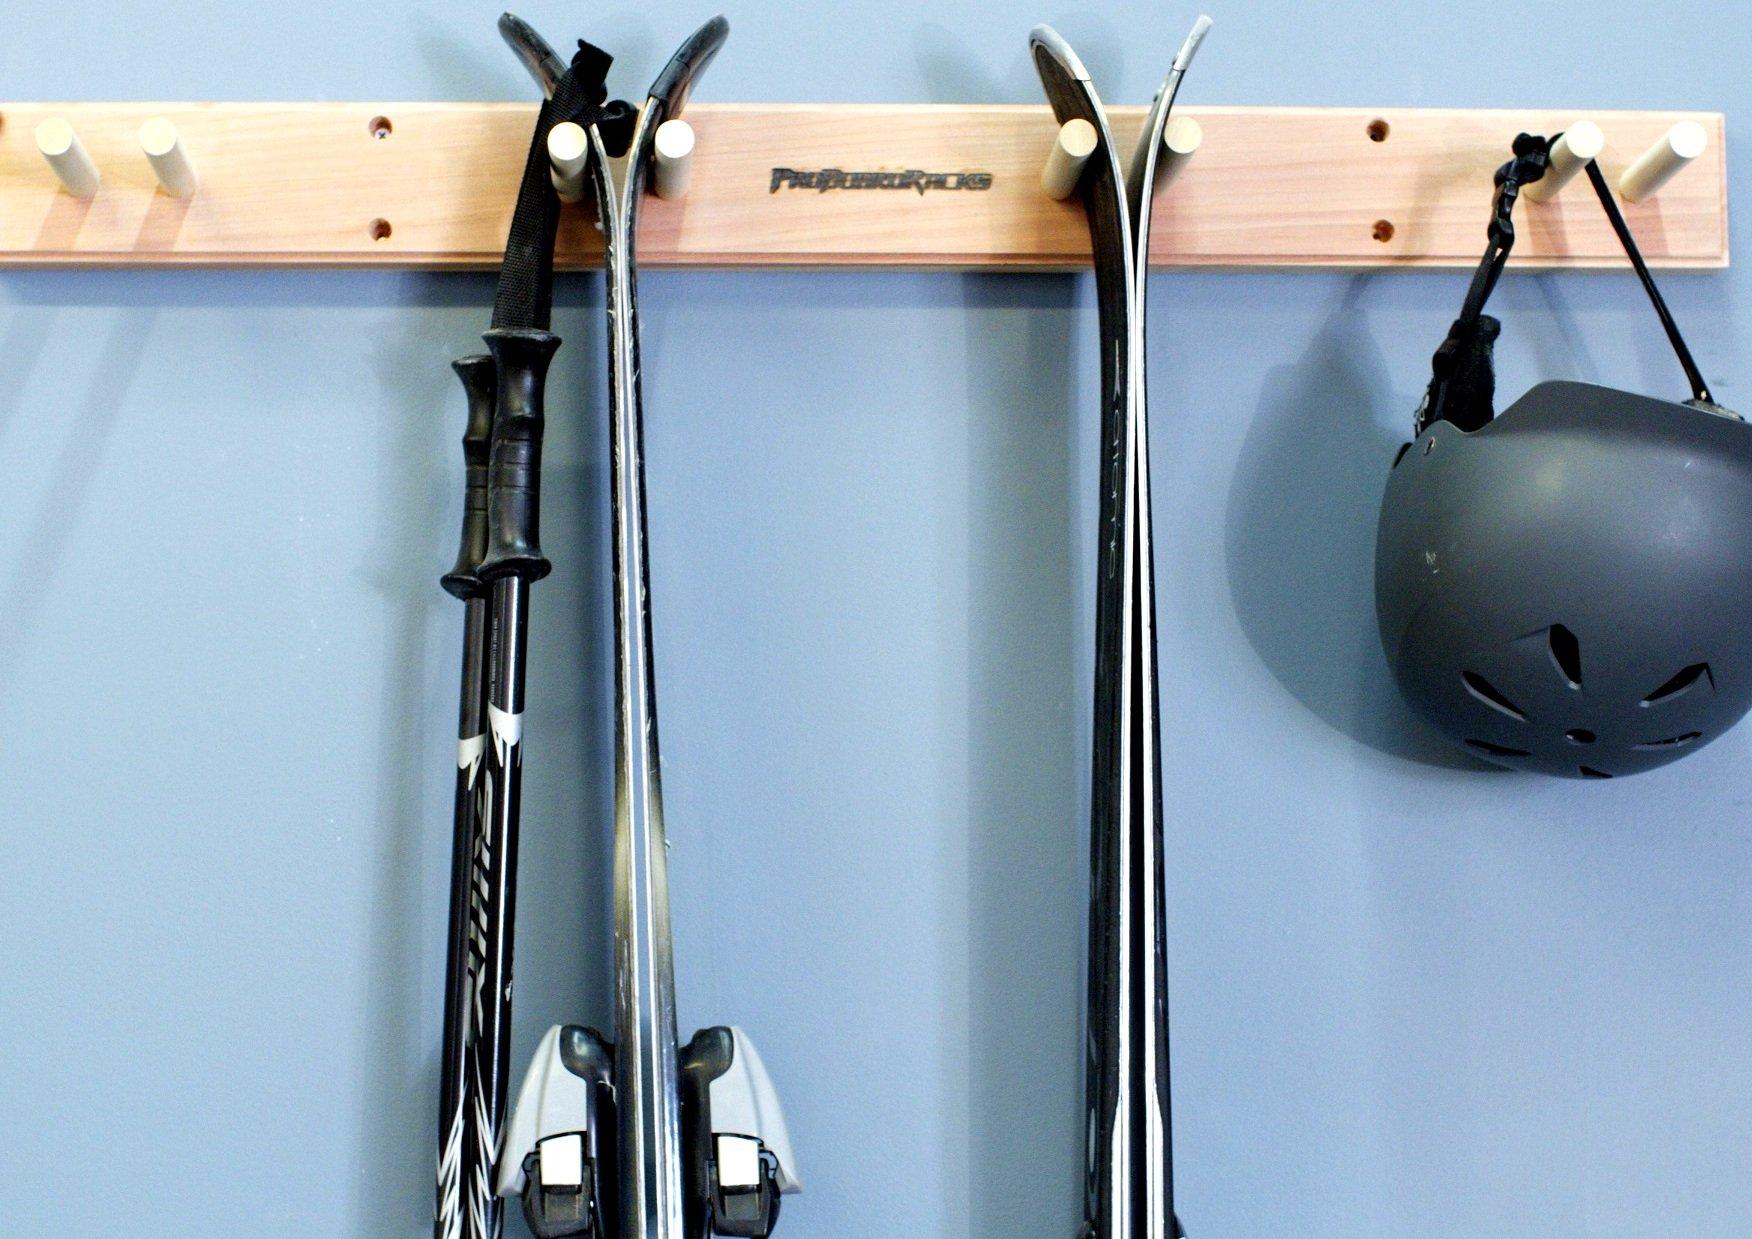 Pro Board Racks Ski Wall Rack Mount - 4 Vertical Sets of Skis